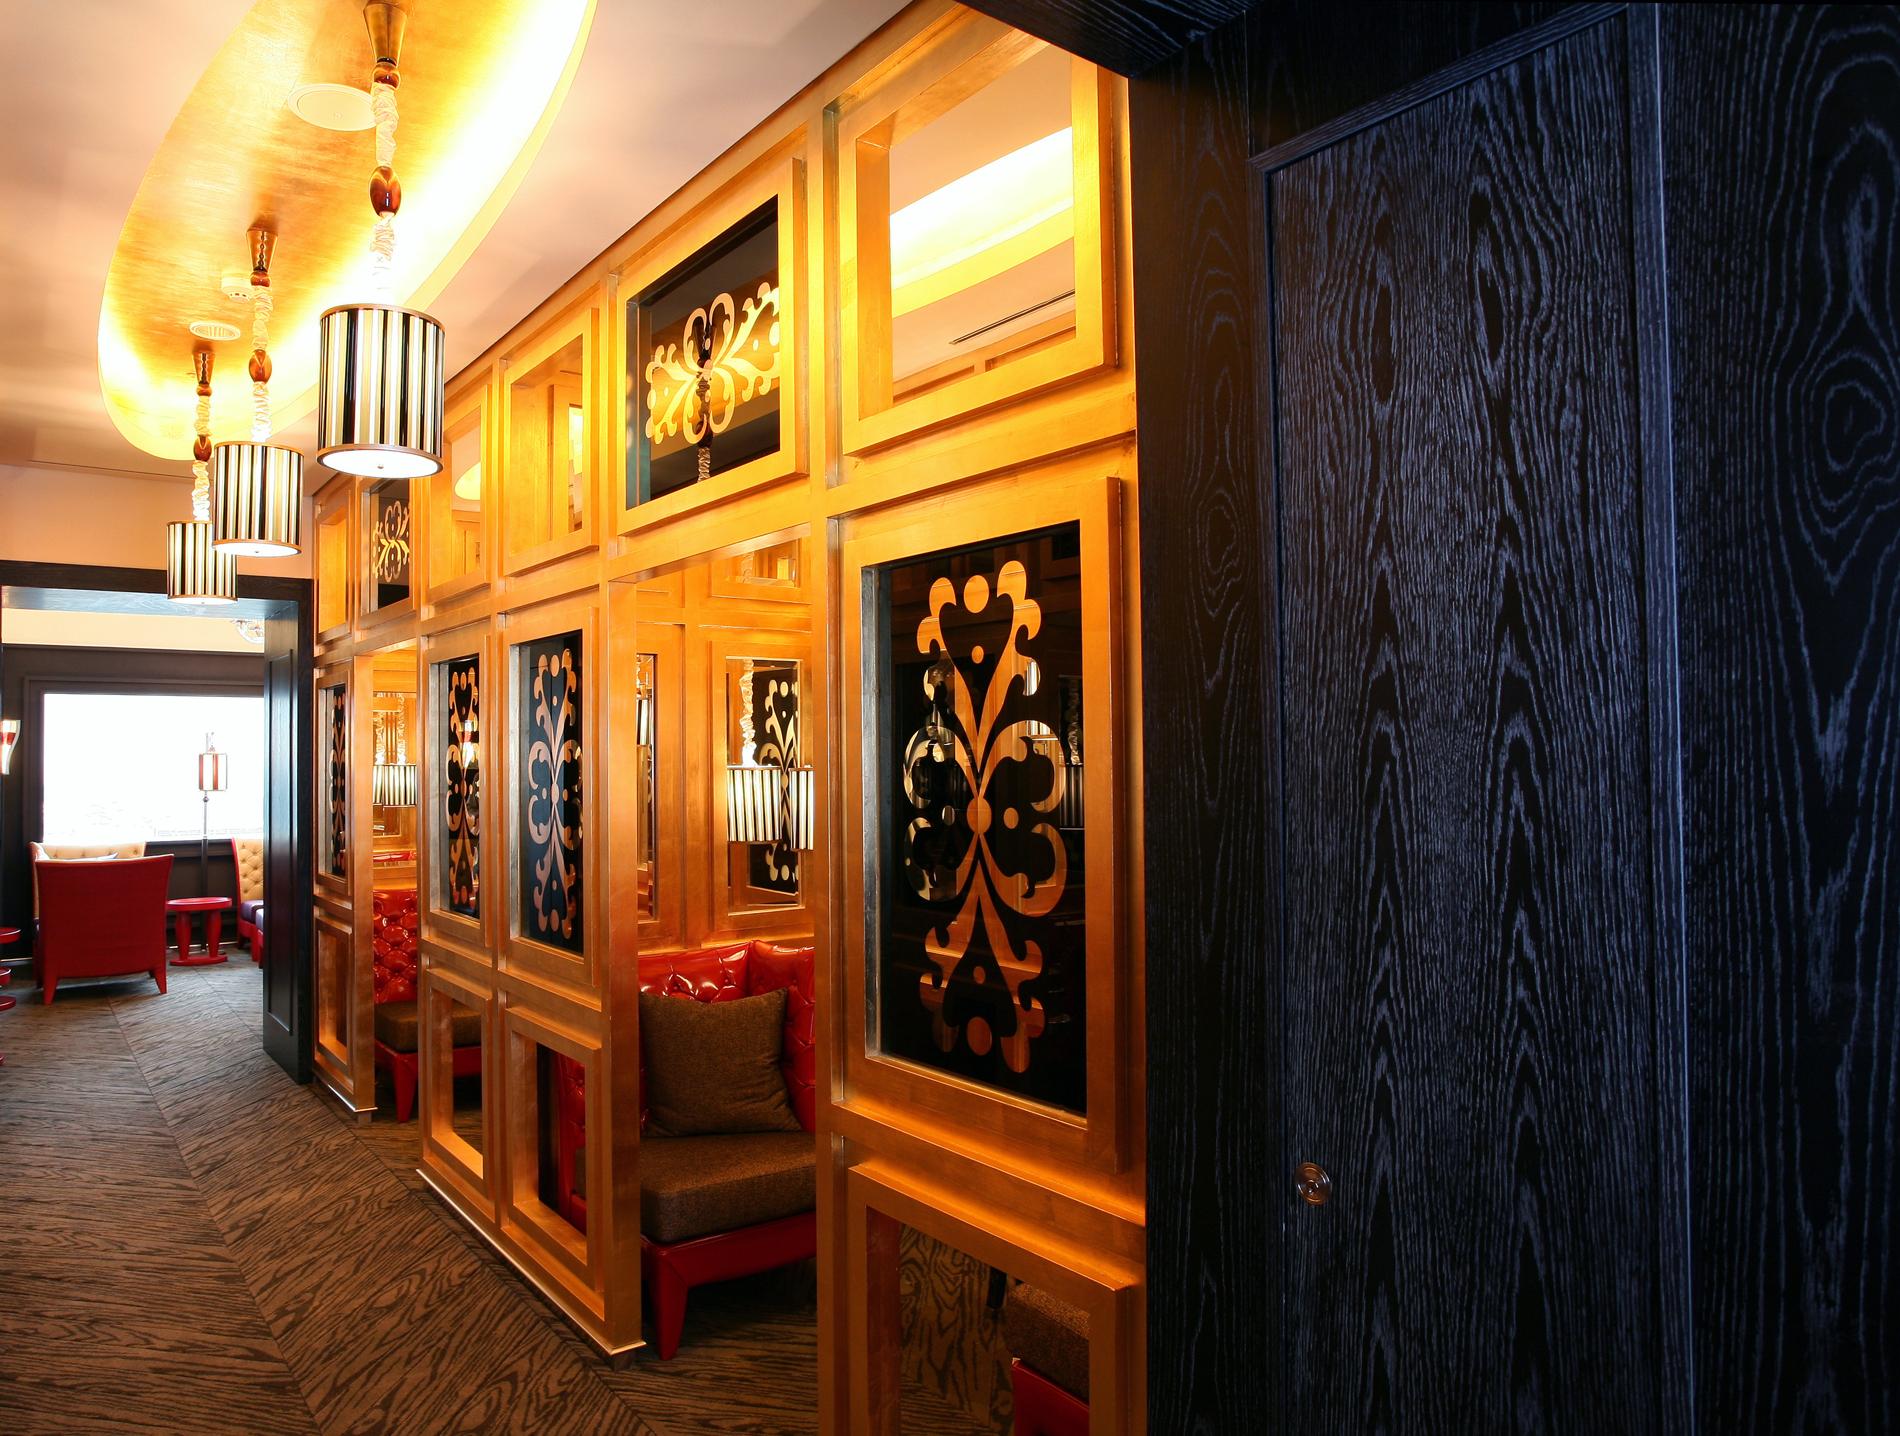 pierre-gagnaire-restaurant-seoul-olivier-gagnere-veronese-1